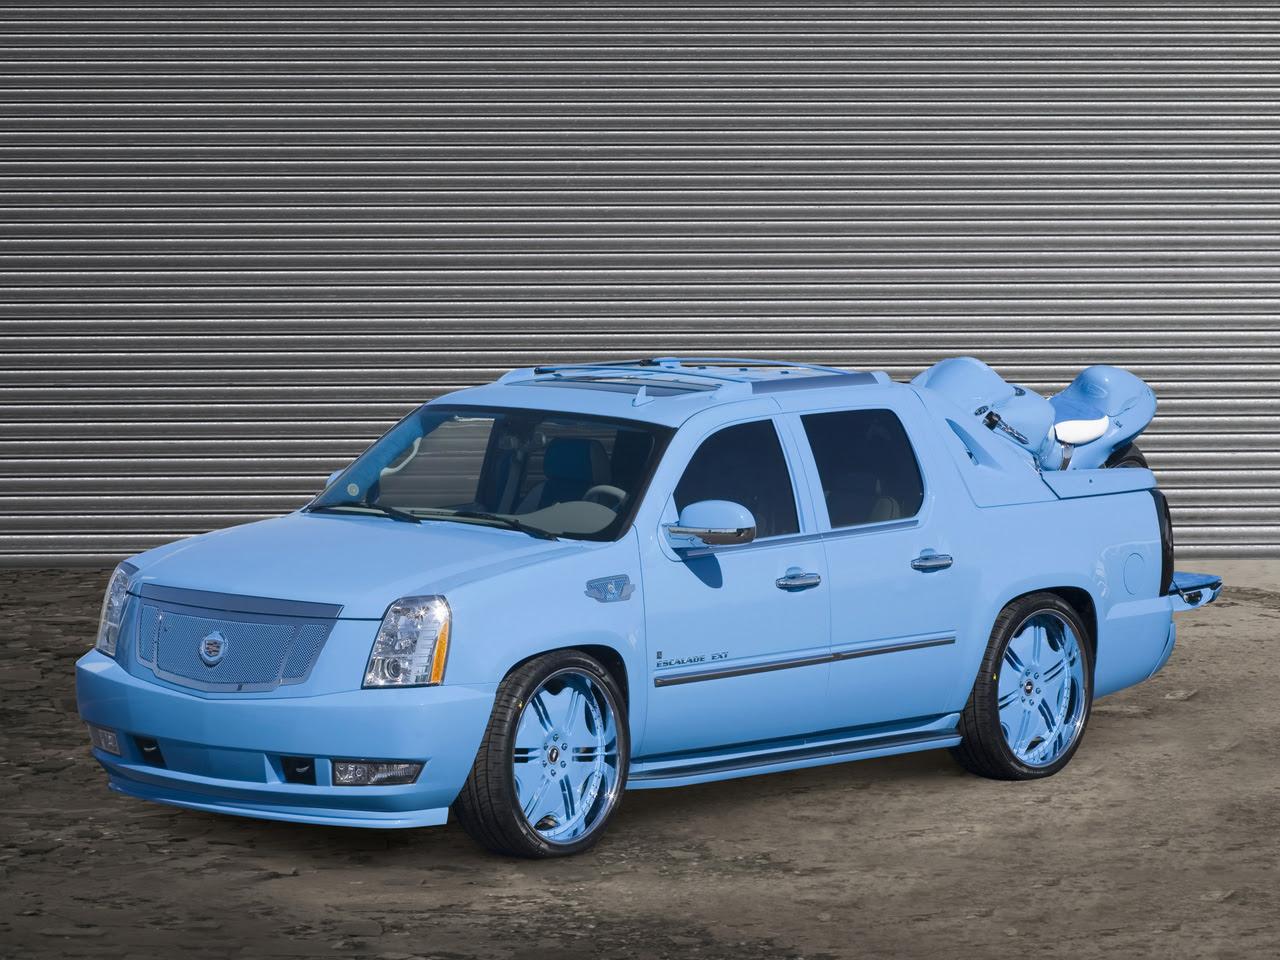 2010 Cadillac Escalade EXT - Pictures - CarGurus